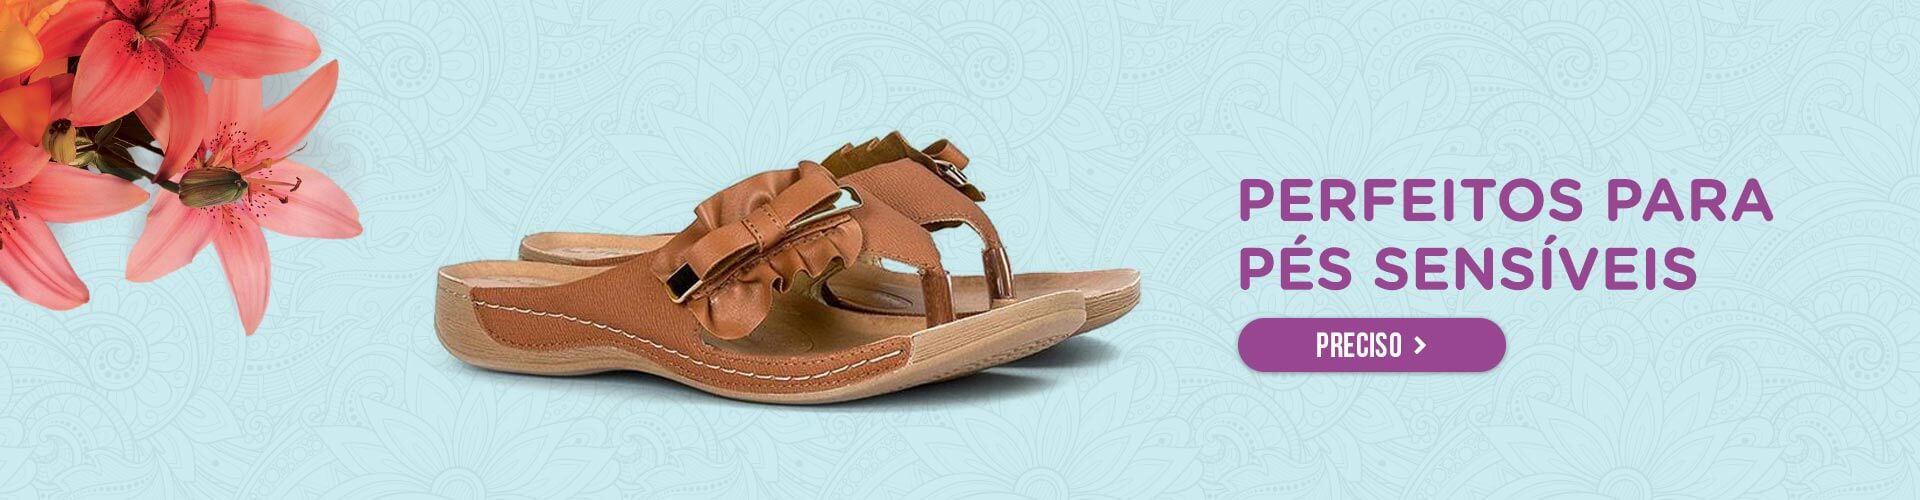 Perfeitos para pés sensíveis